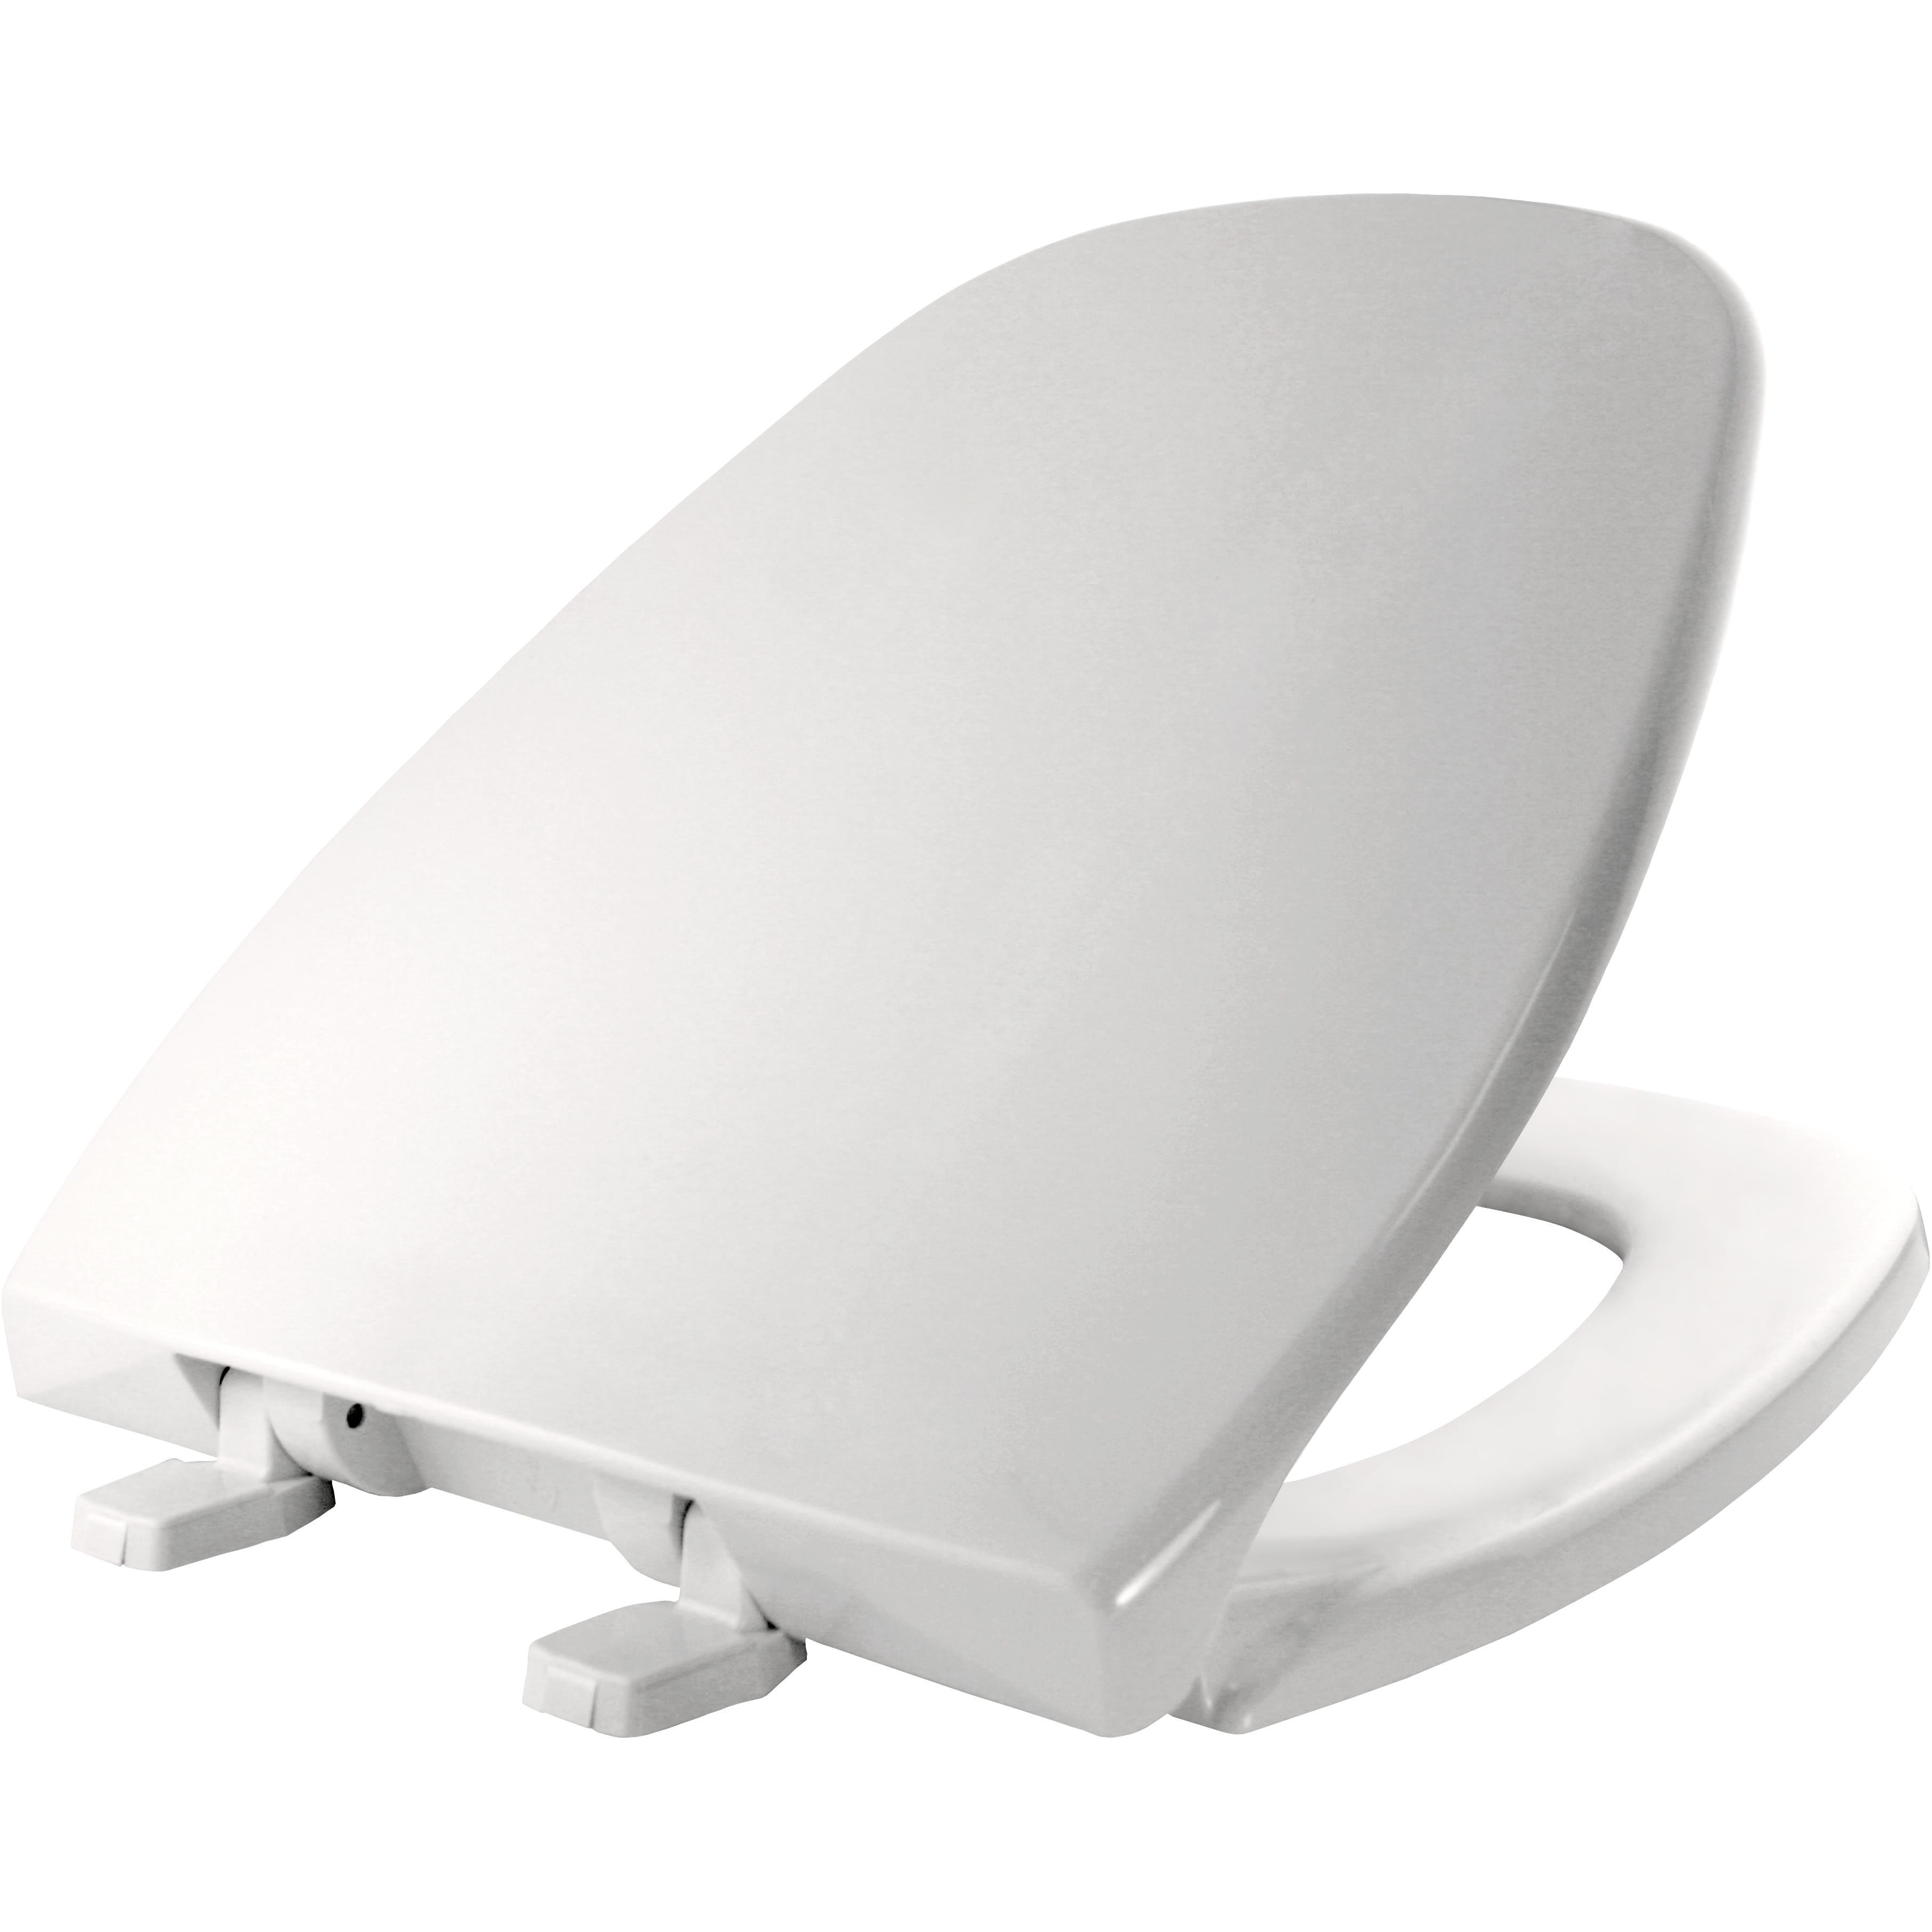 Cool Bemis 1240200 036 Natural Round Plastic Toilet Seat Faucet Com Short Links Chair Design For Home Short Linksinfo